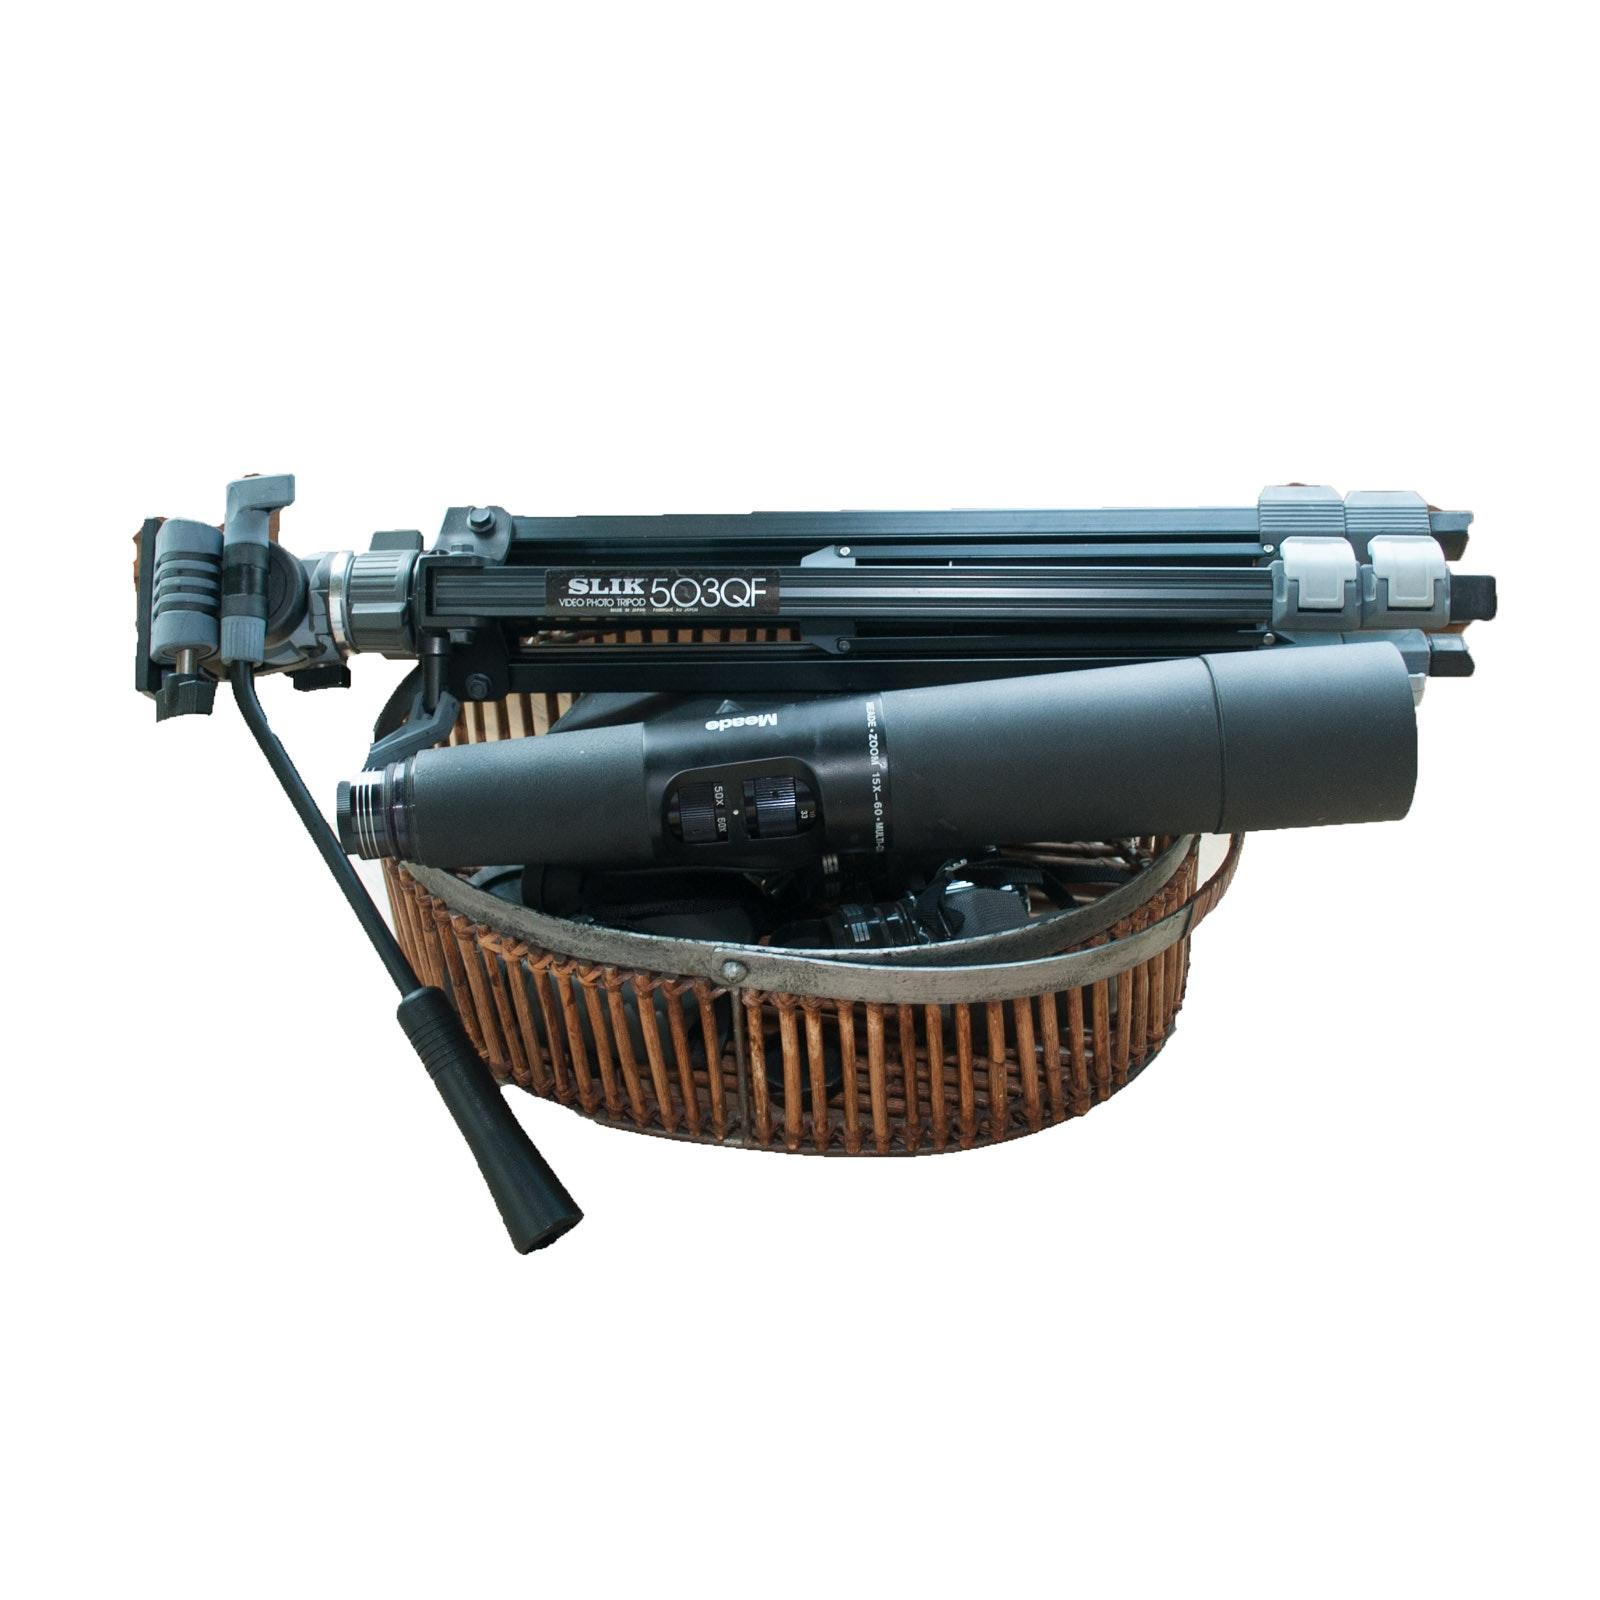 Meade Telescope, Slik Tripod and Binoculars